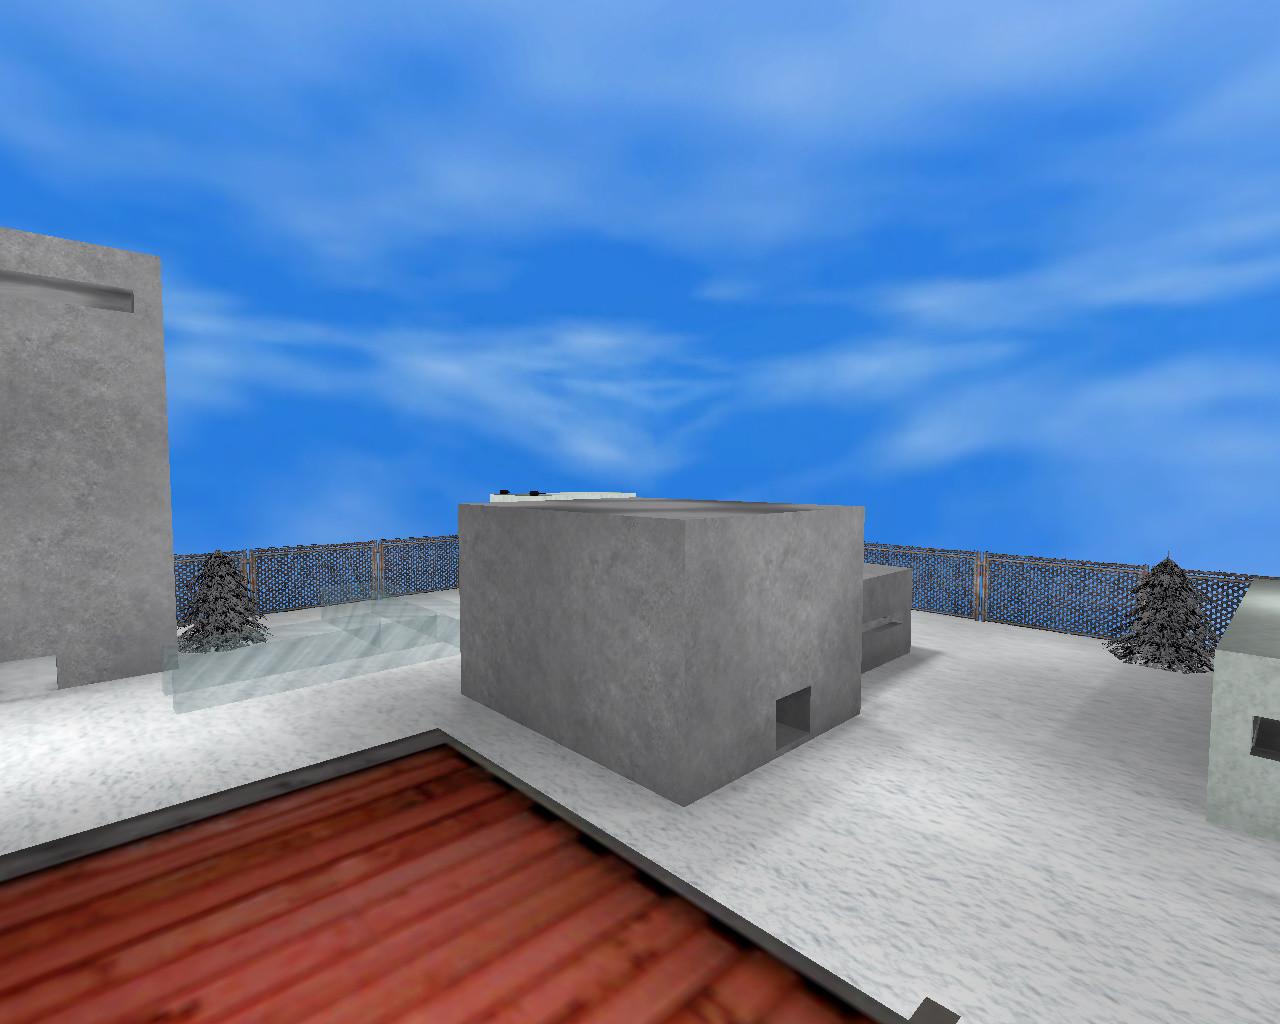 zm antarctica base